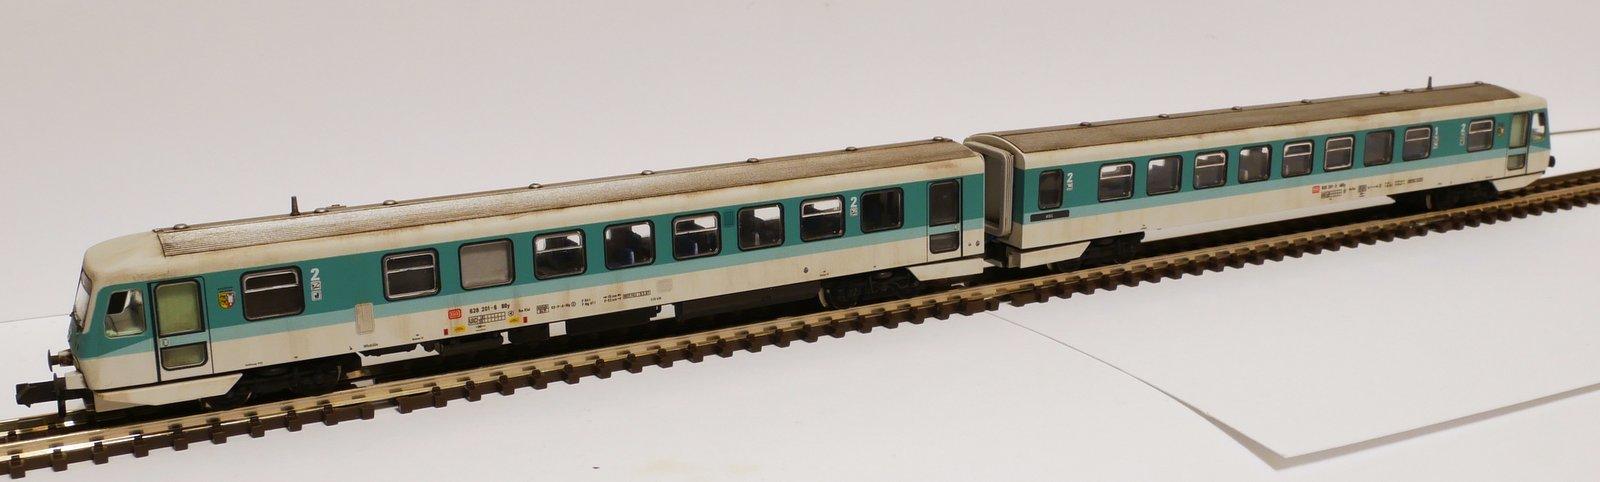 P1140770-001.JPG